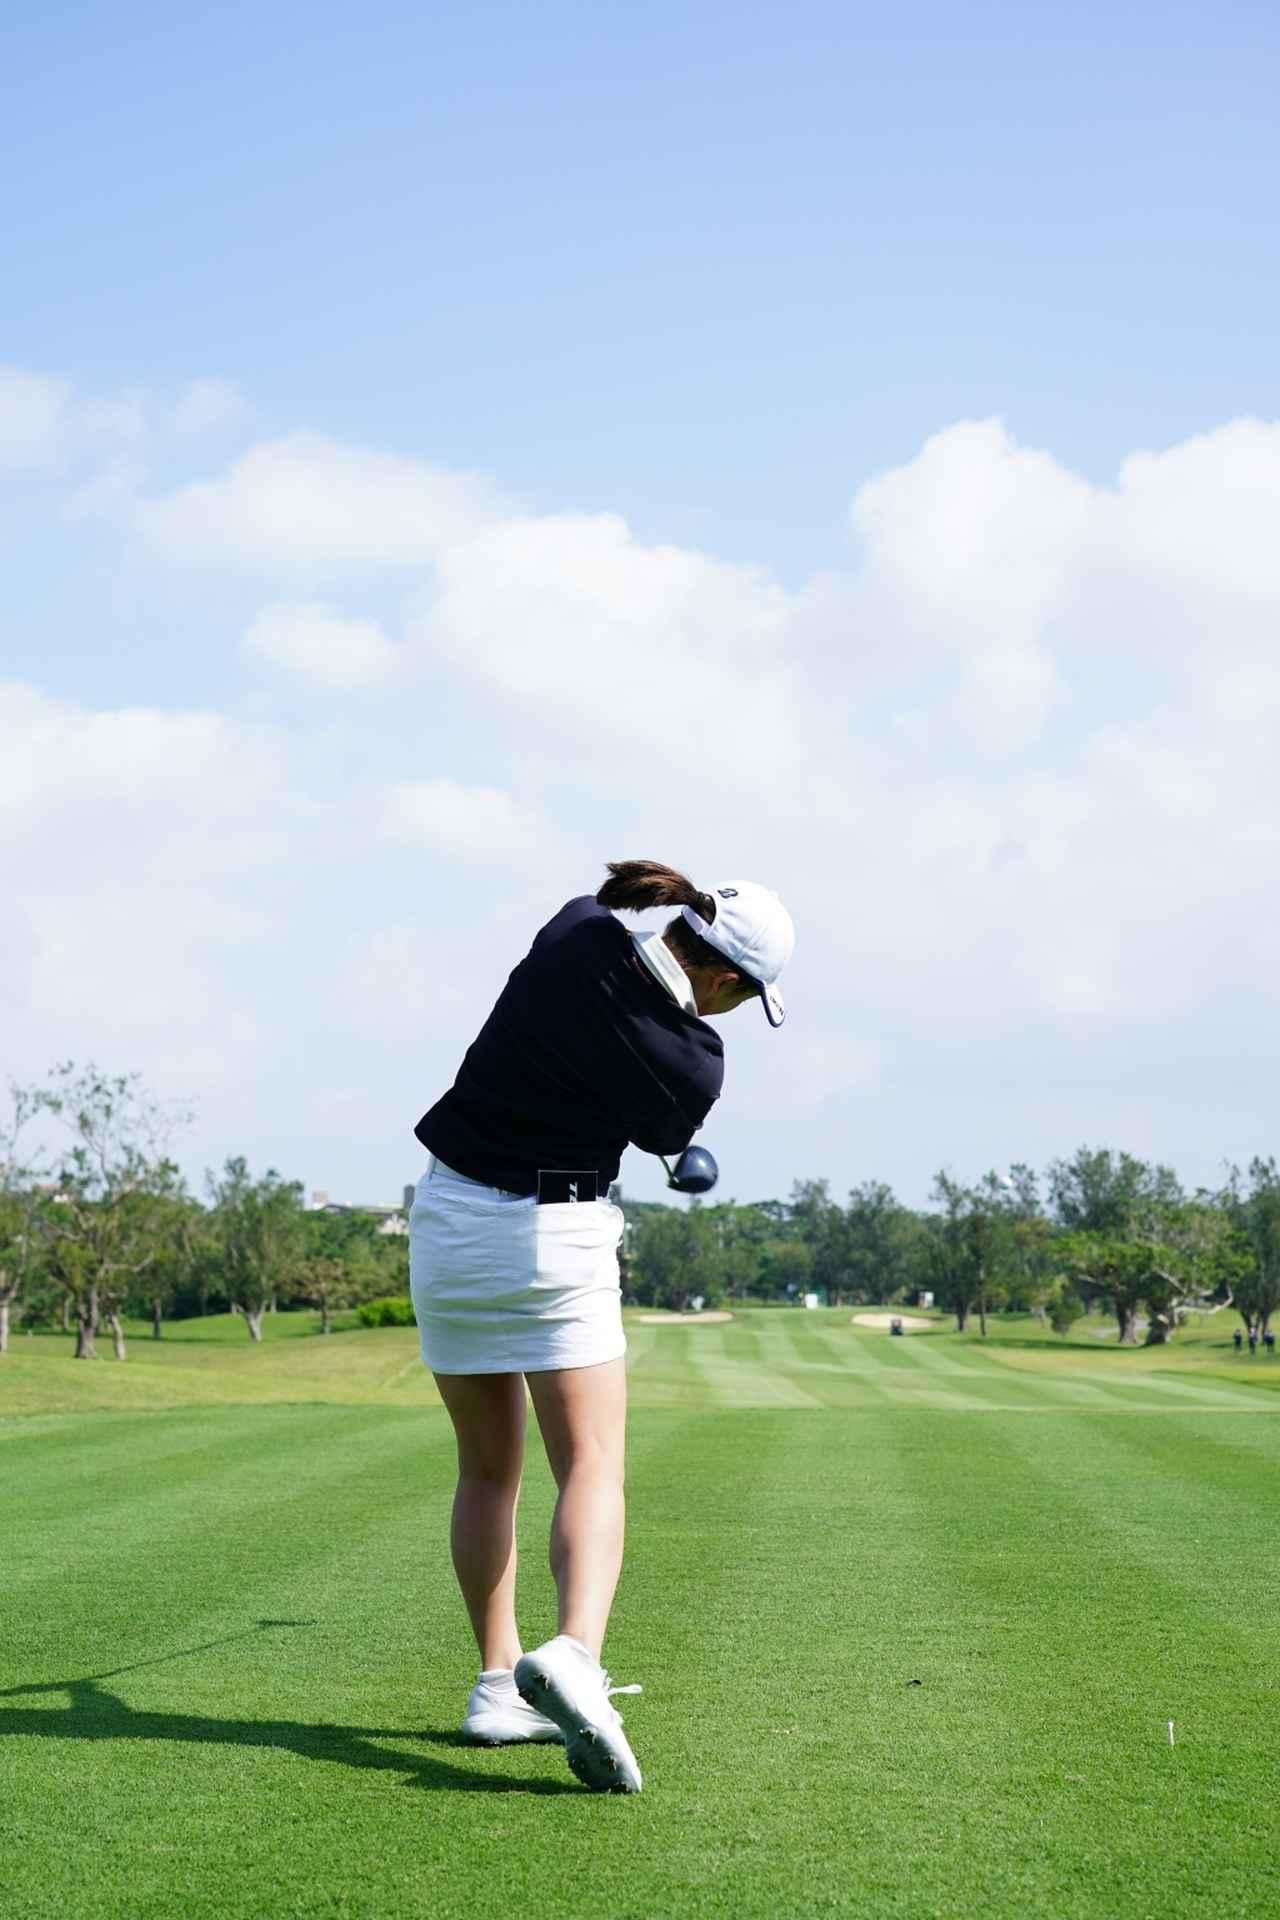 Images : 15番目の画像 - 丹萌乃のドライバー連続写真 - みんなのゴルフダイジェスト